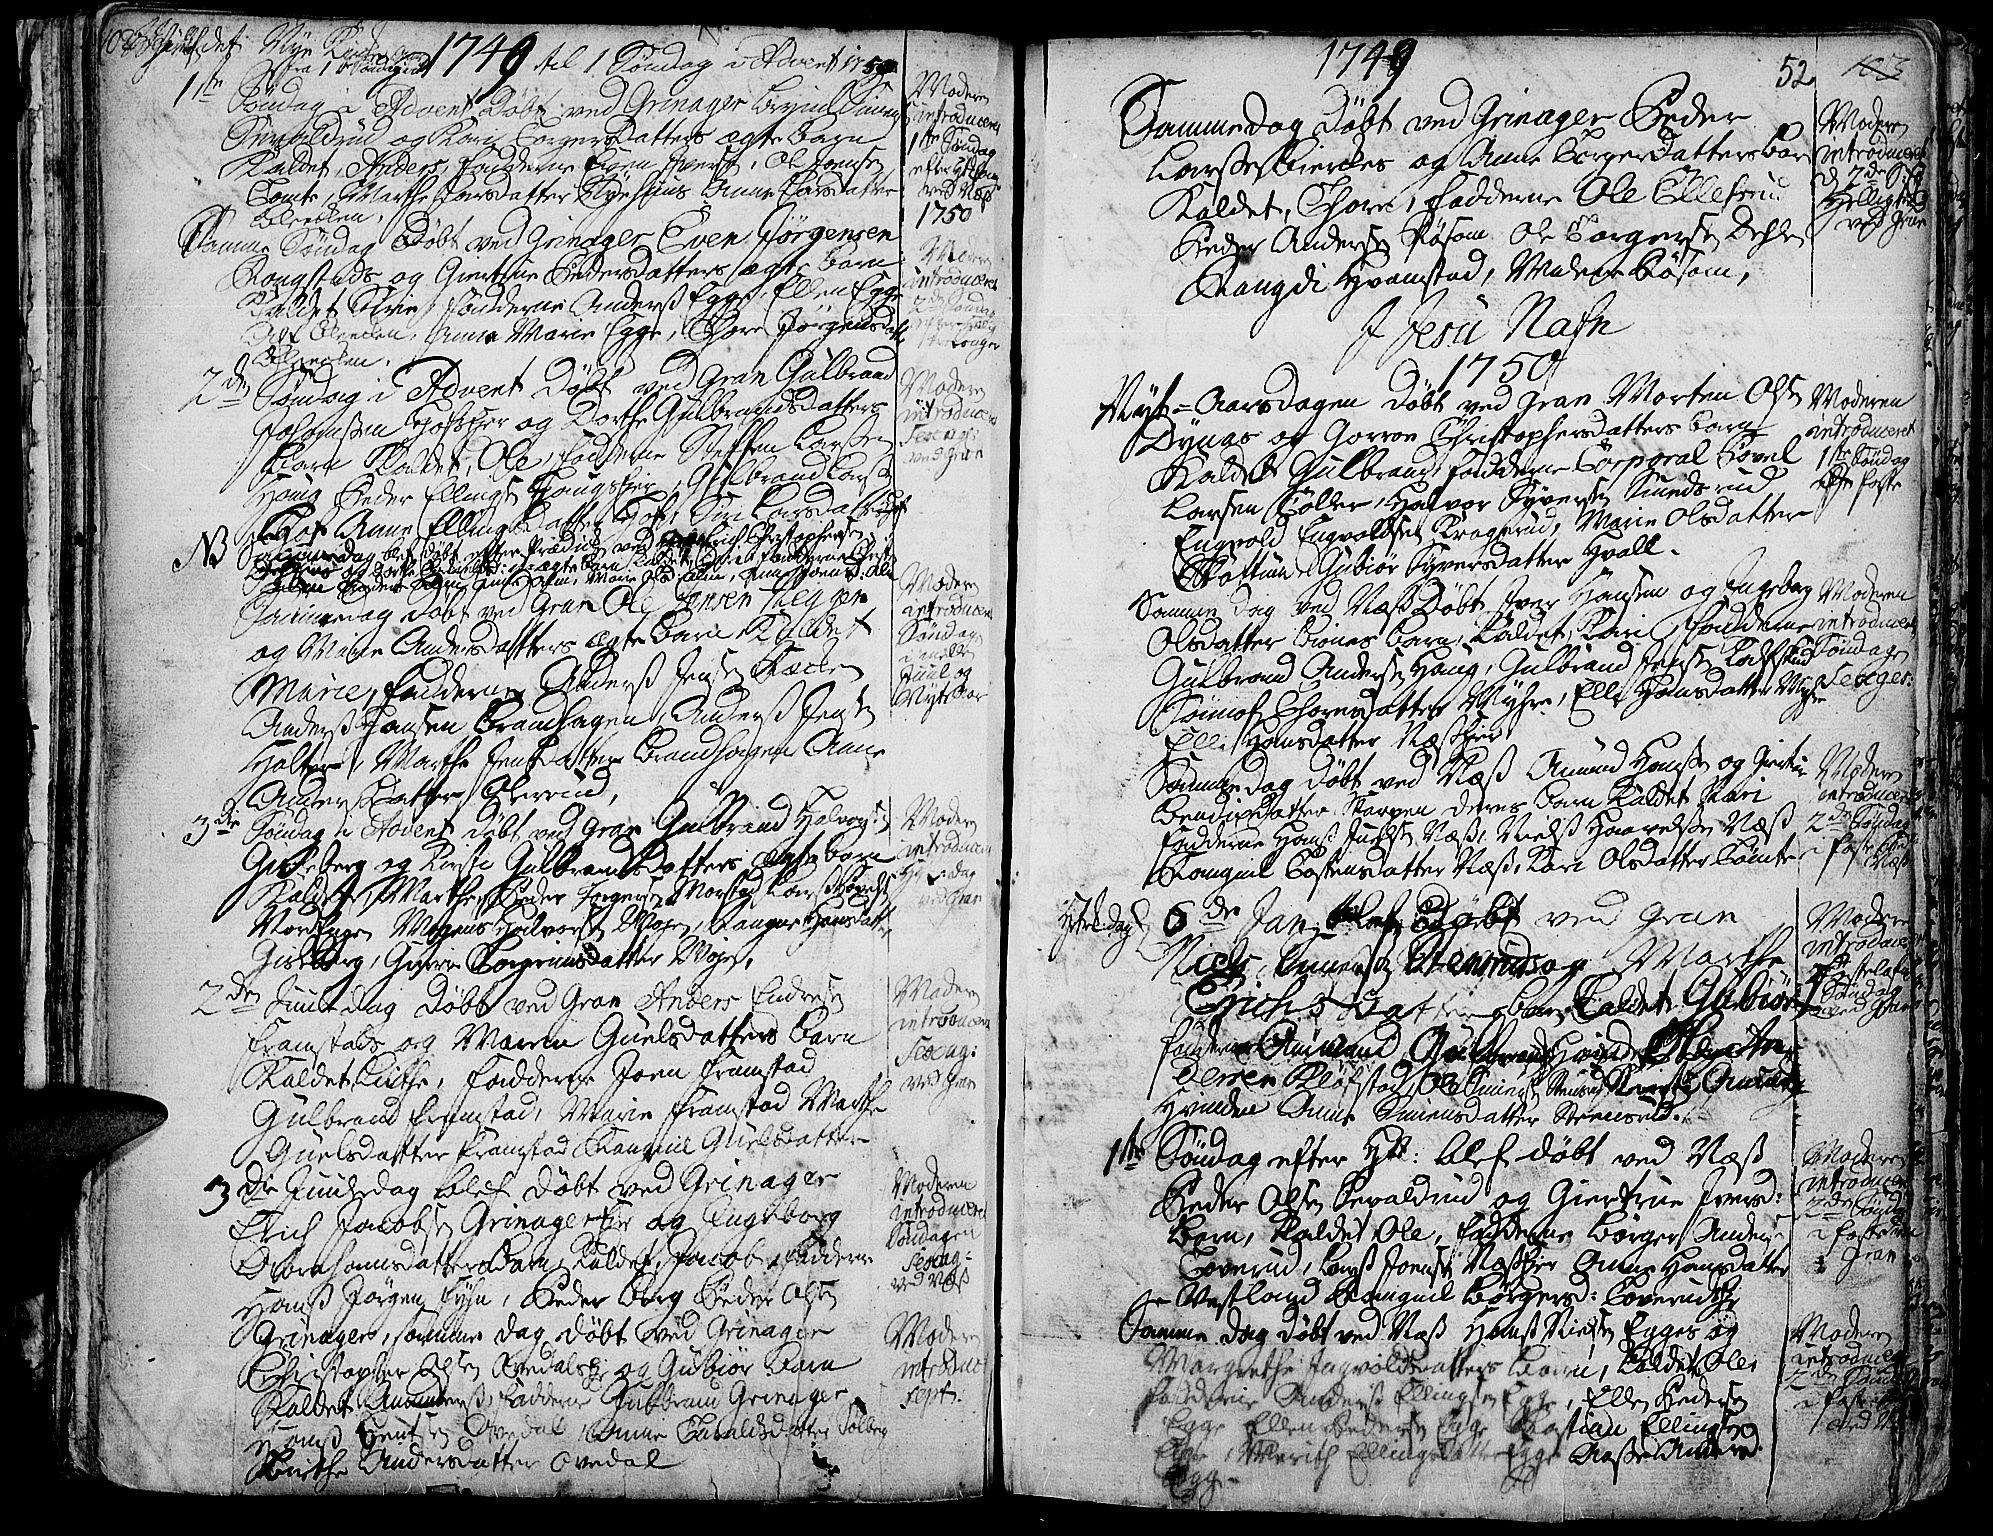 SAH, Gran prestekontor, Ministerialbok nr. 3, 1745-1758, s. 52